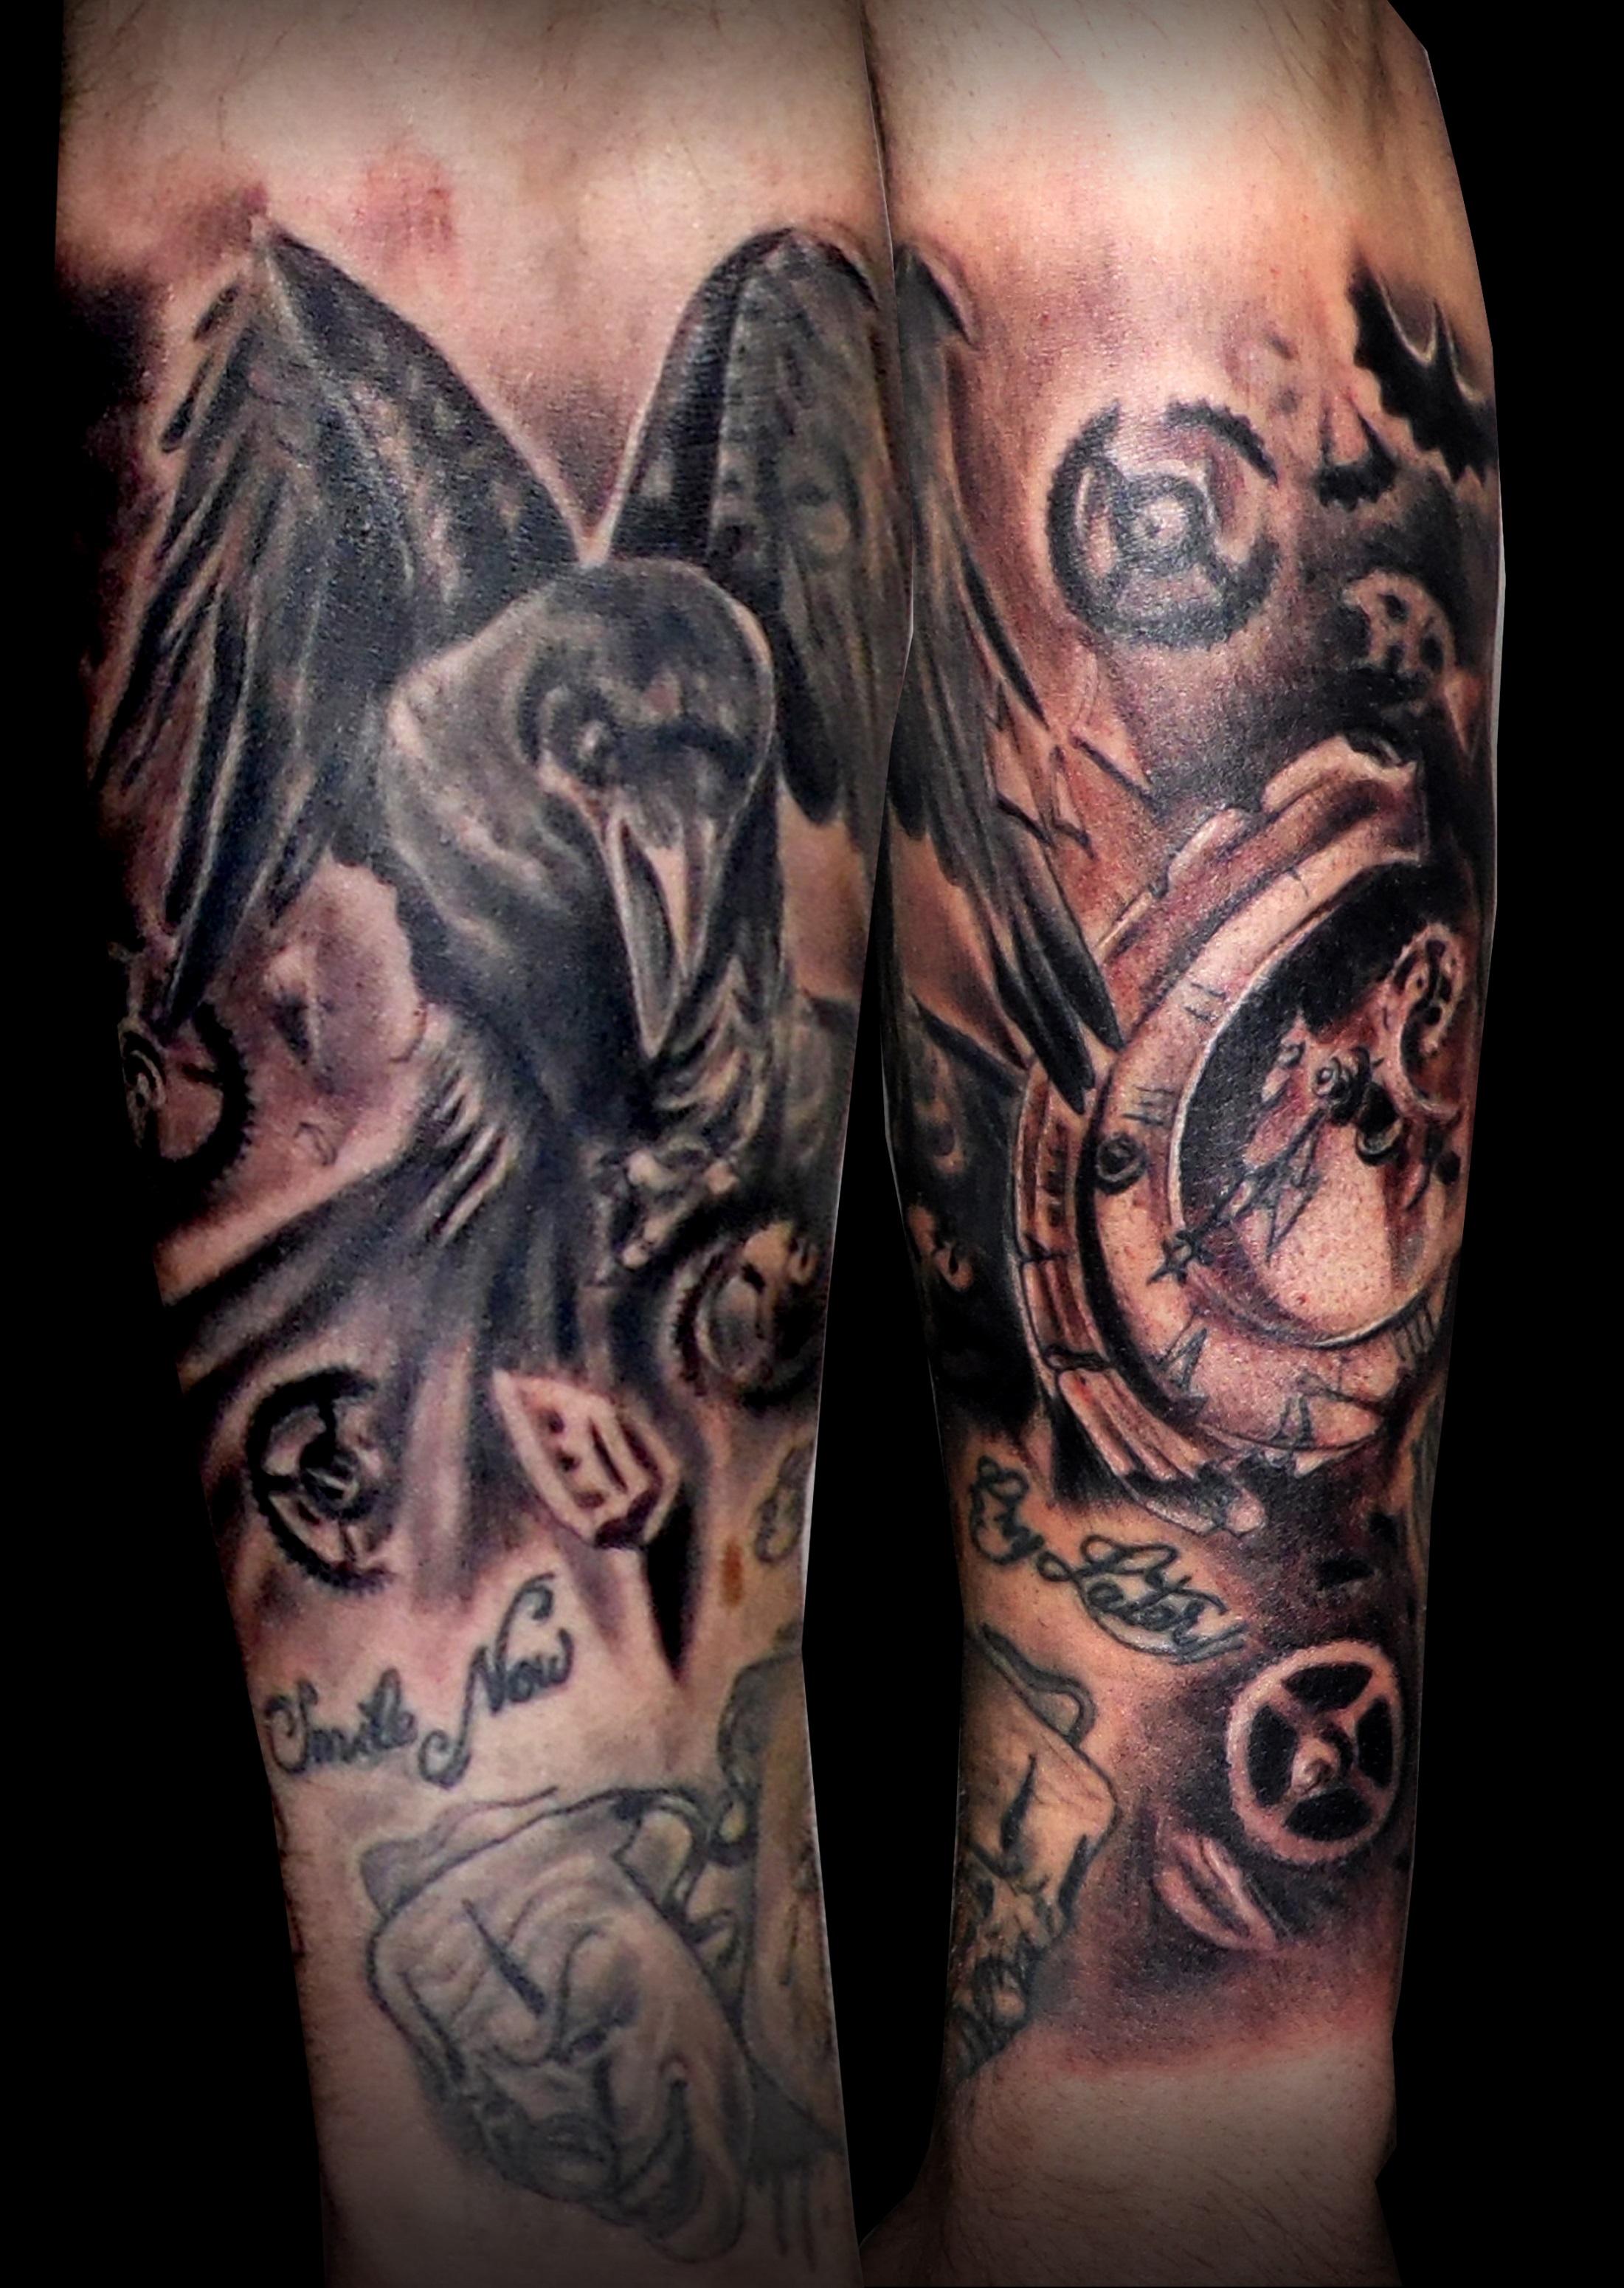 cuervo reloj roto tattoo tattoos tatuajes black grey trecepicas 13depicas huesca jaca antebrazo negro sombras